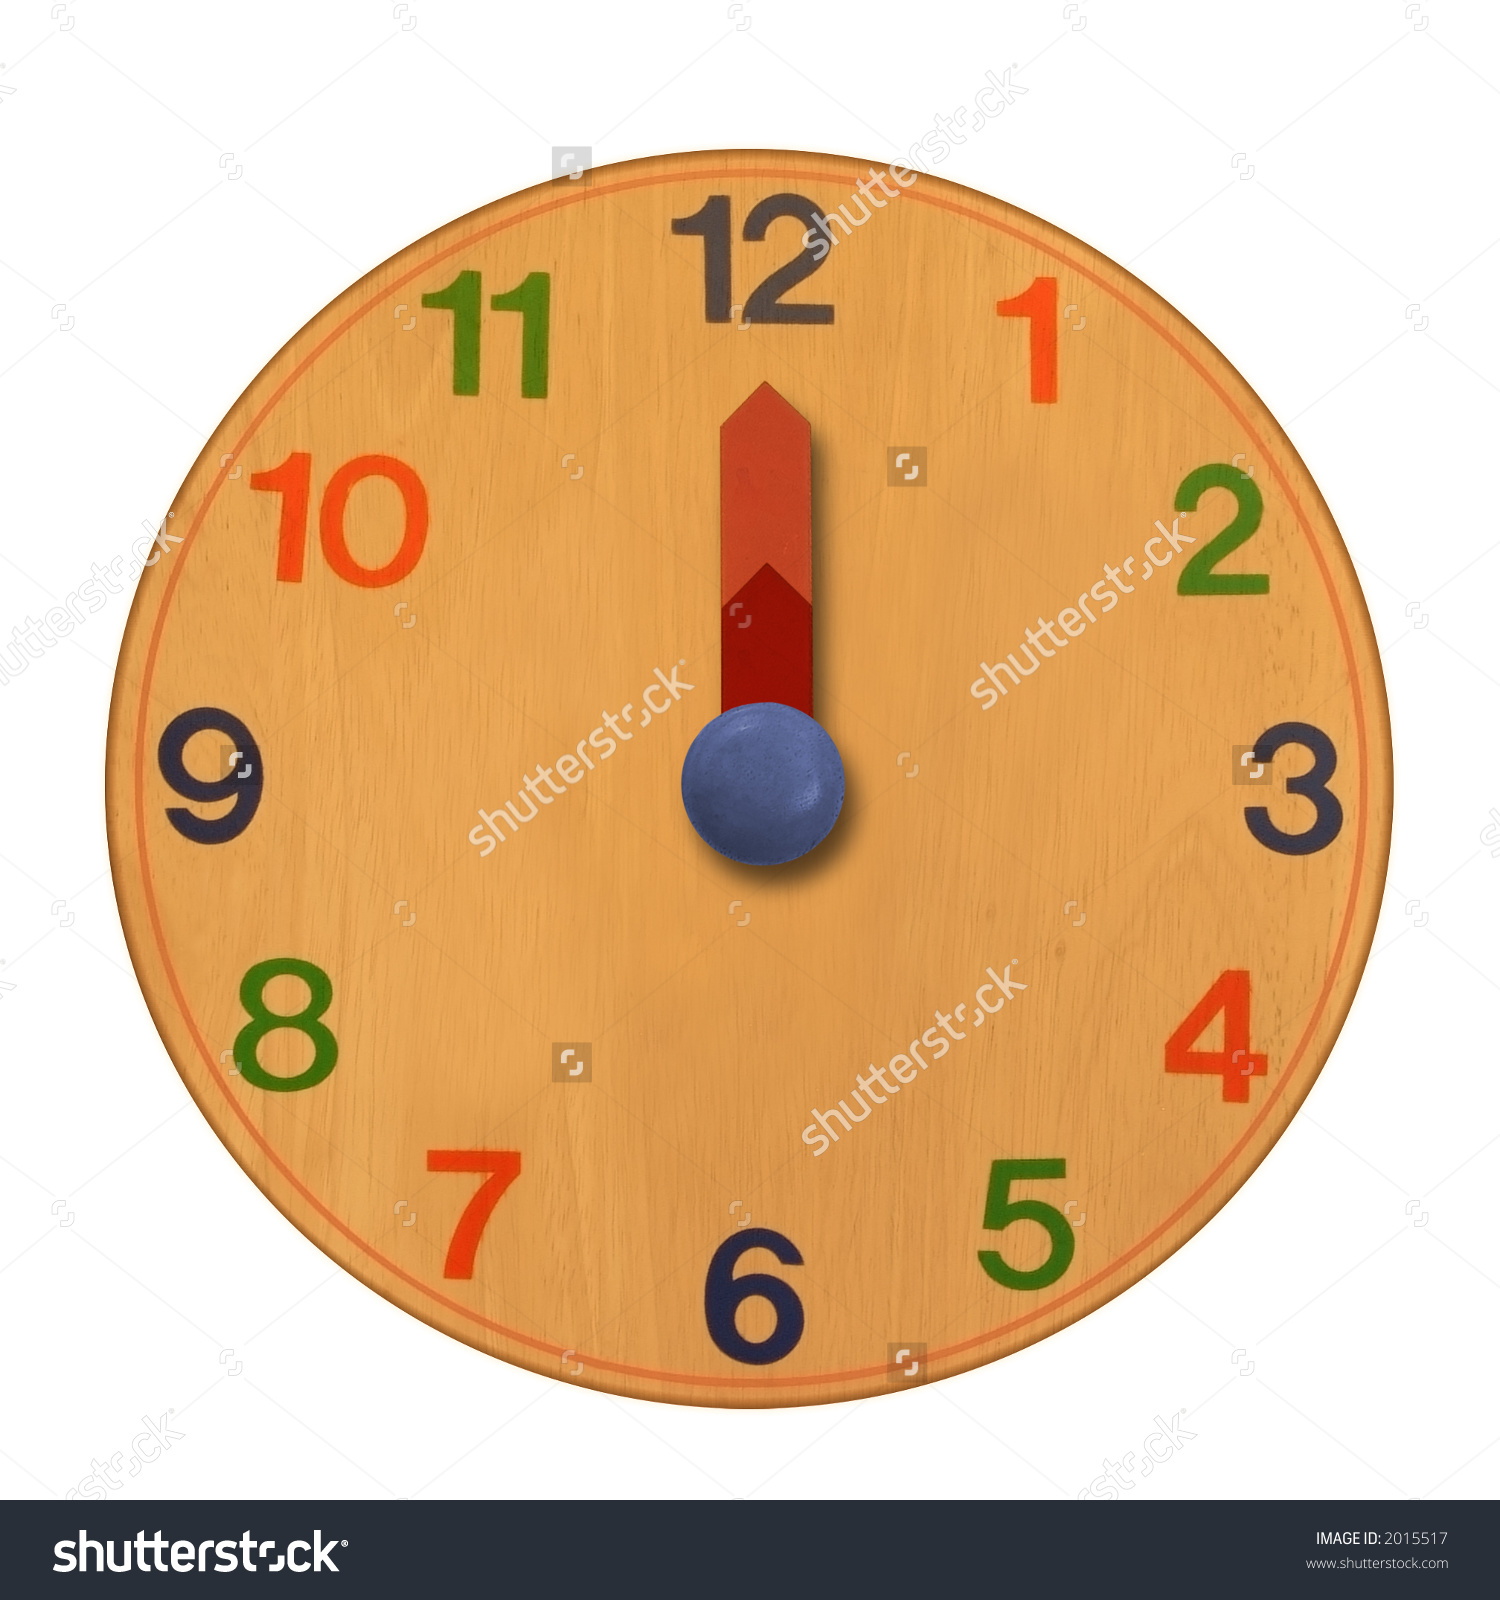 Wooden Clock Midnight Twelve Oclock Stock Photo 2015517.